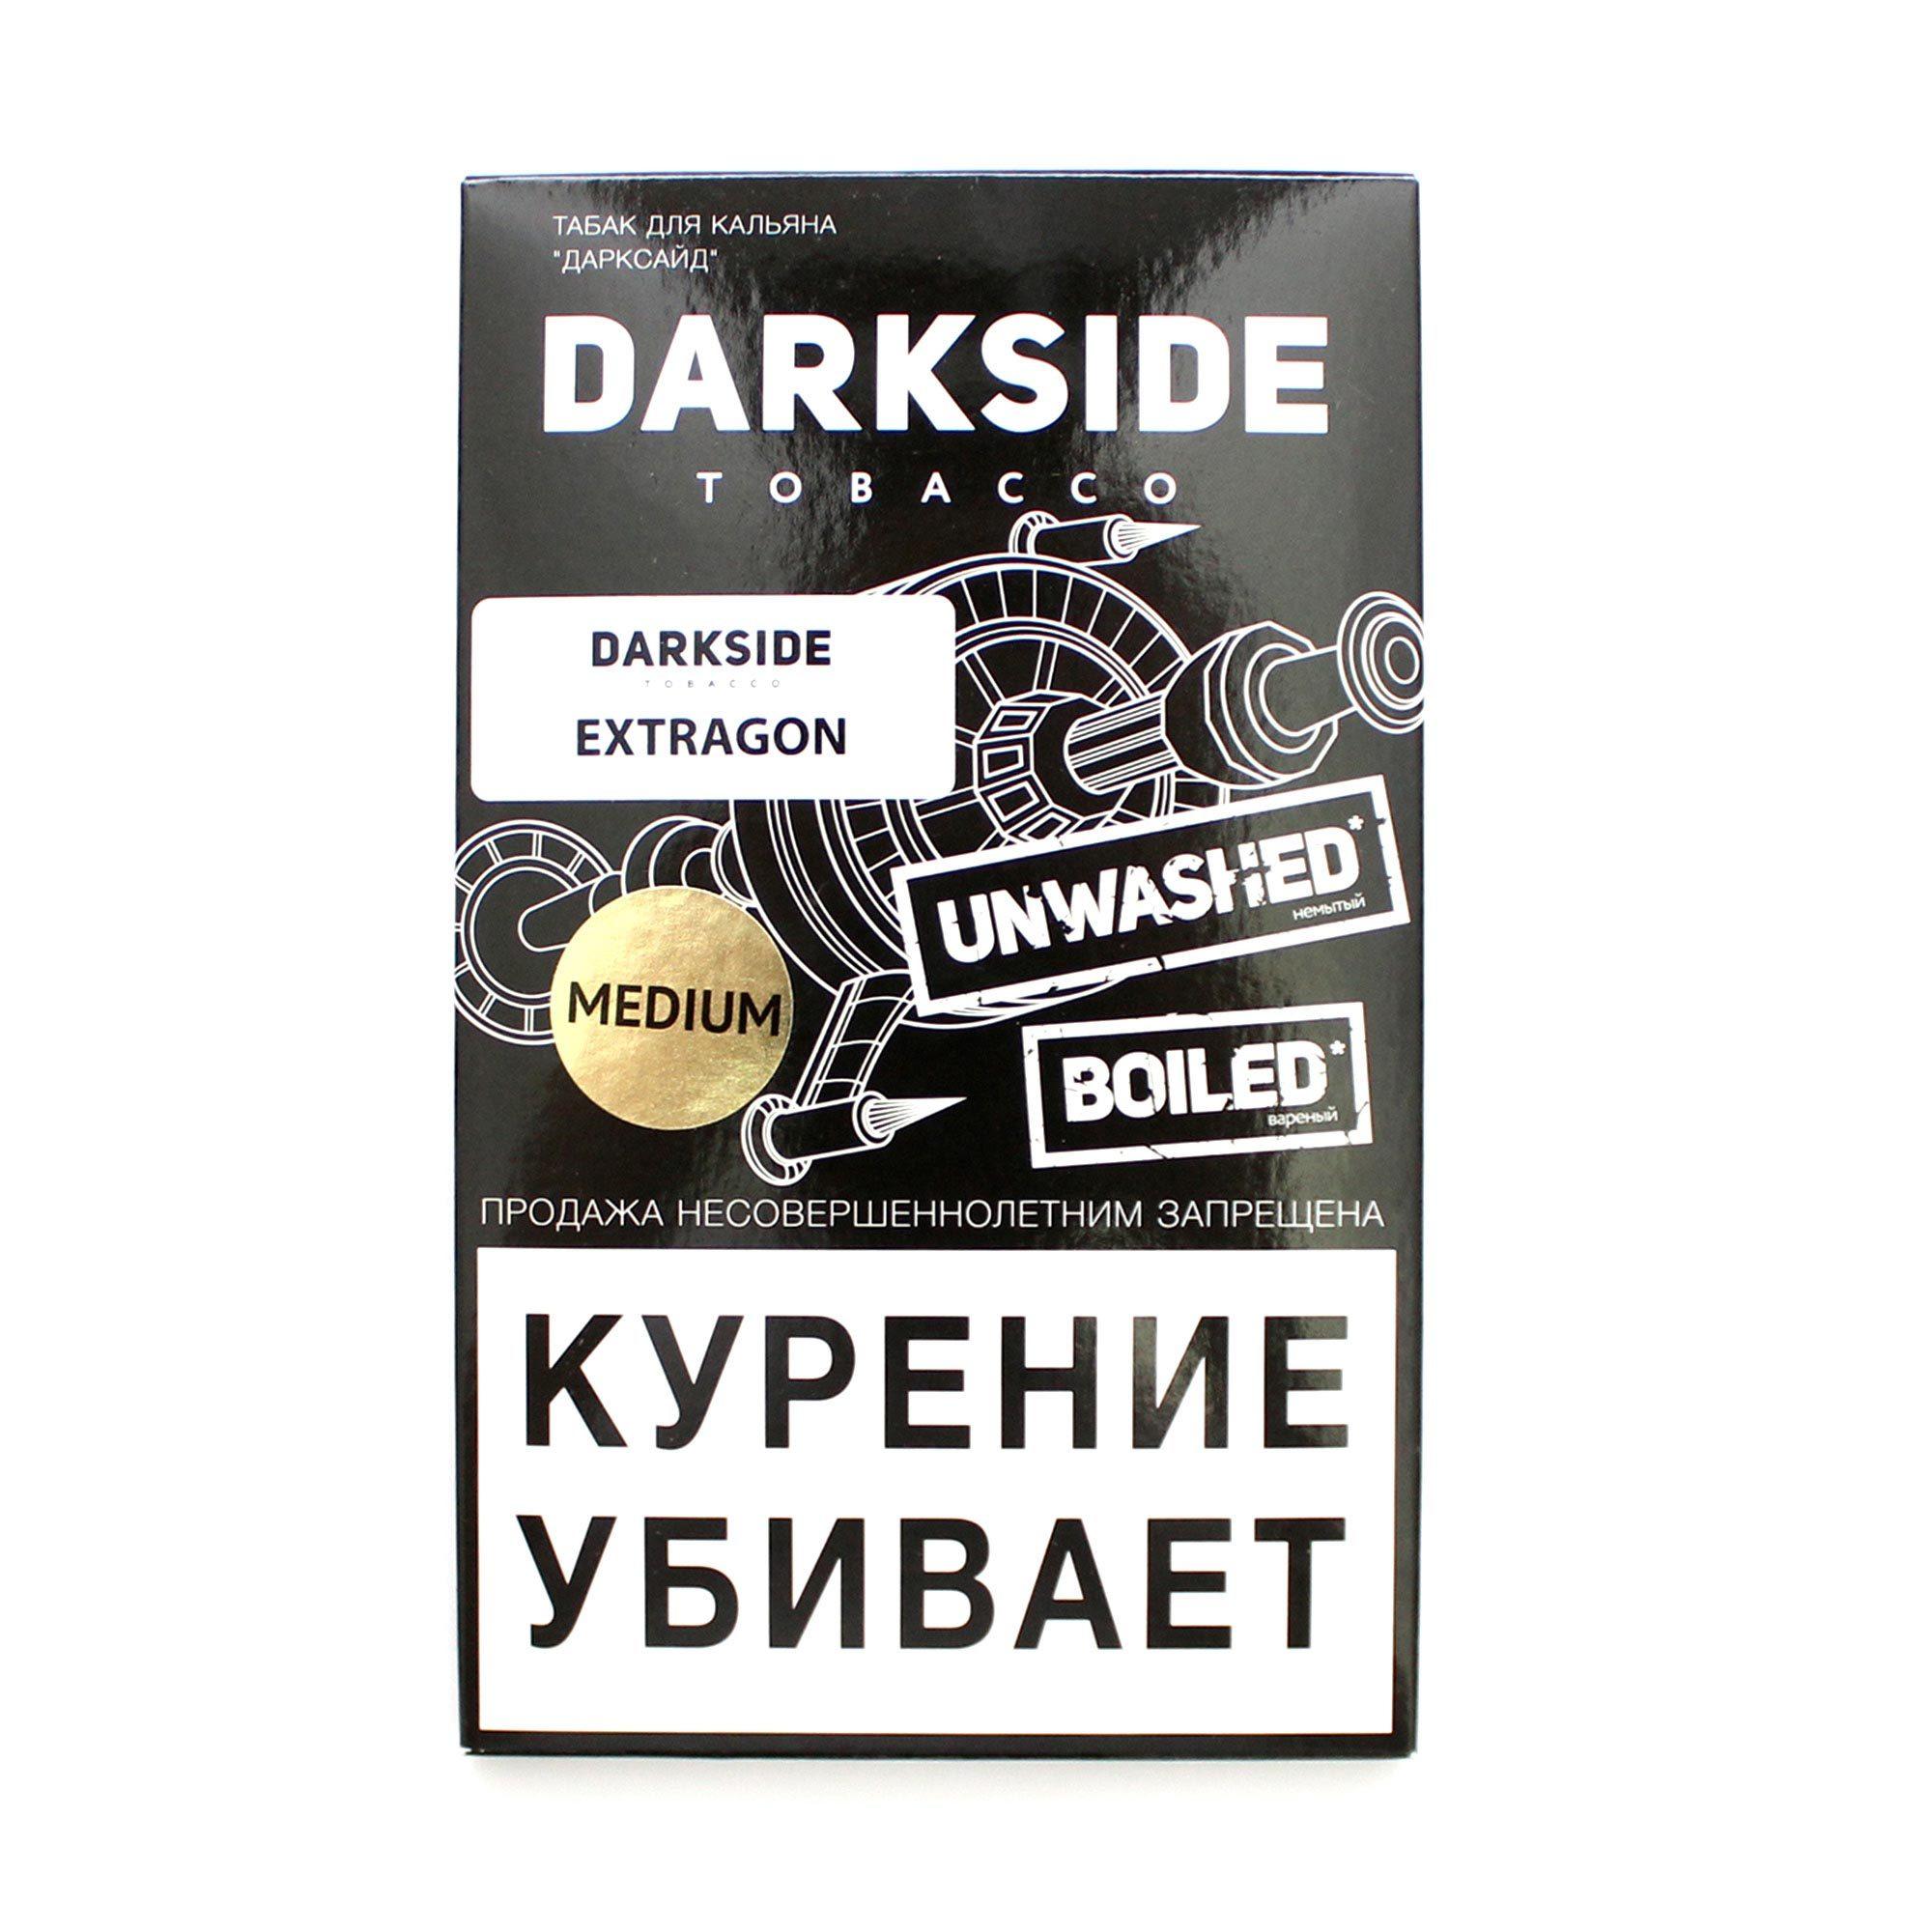 Табак для кальяна Dark Side Medium 100 гр. Extragon